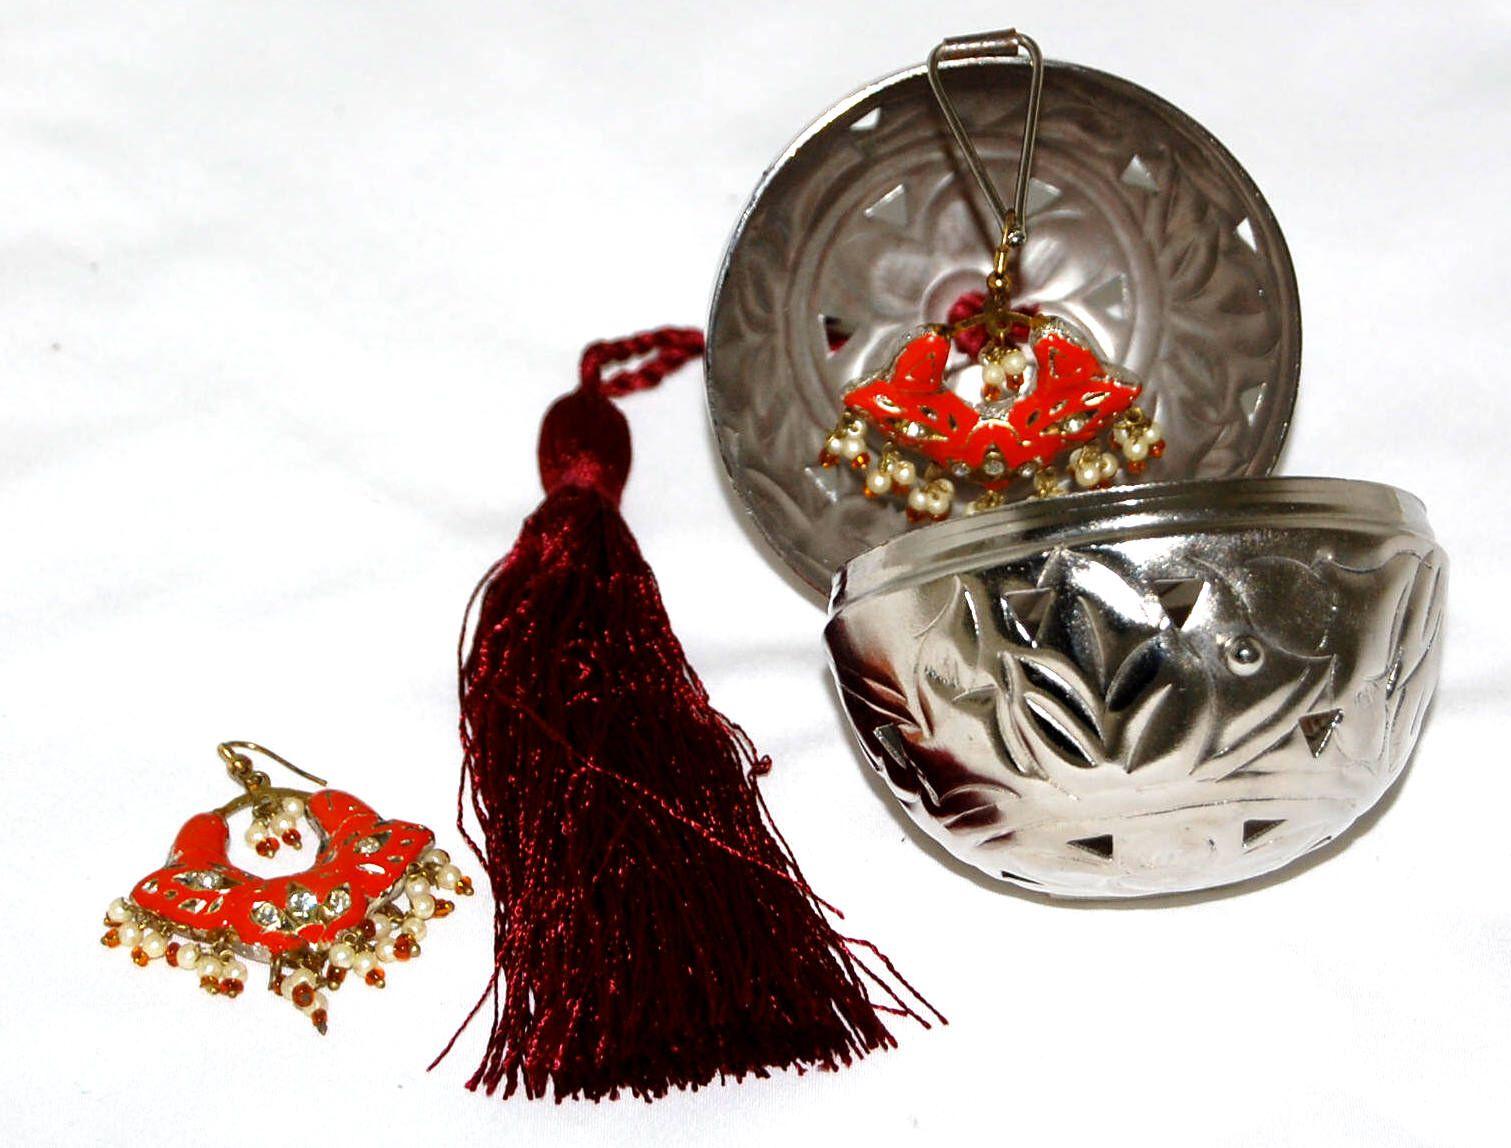 Friendship ball ornament - English Friendship Ball Add A Surprise Gift Ball Price 27